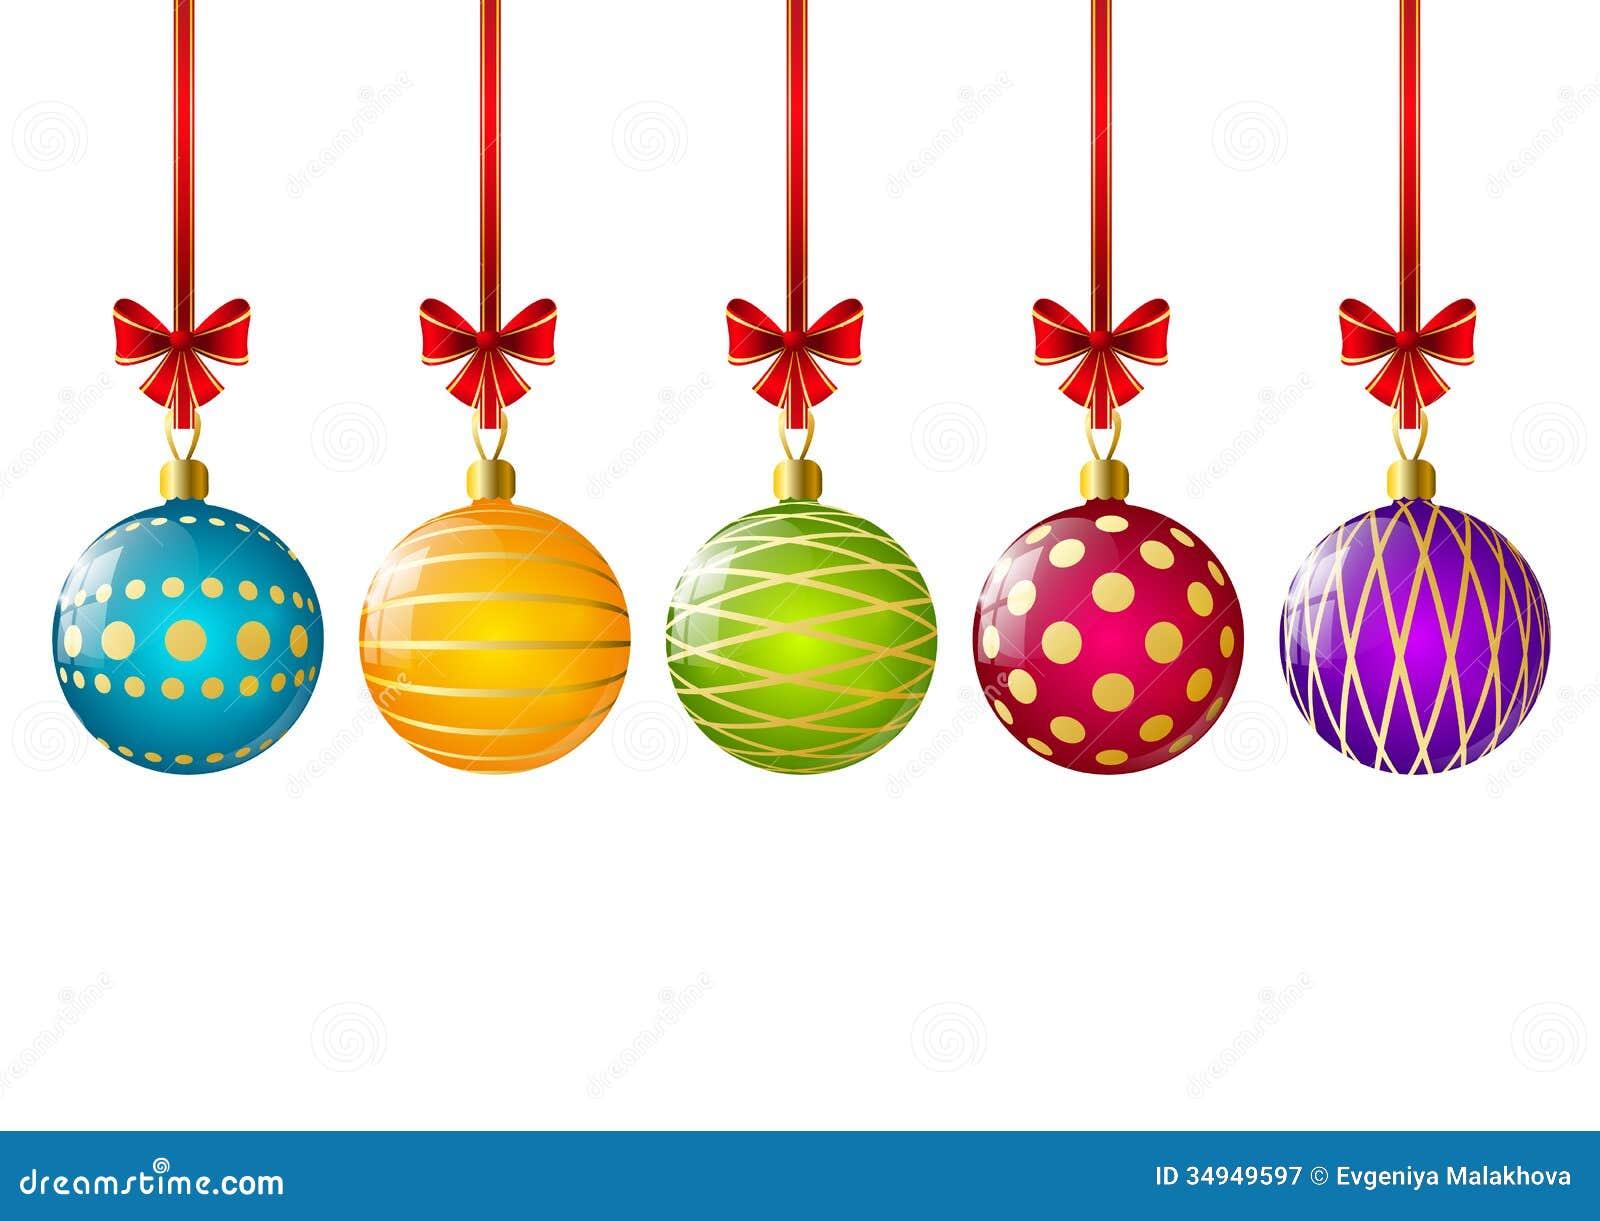 Christmas Stocking Tree Decoration